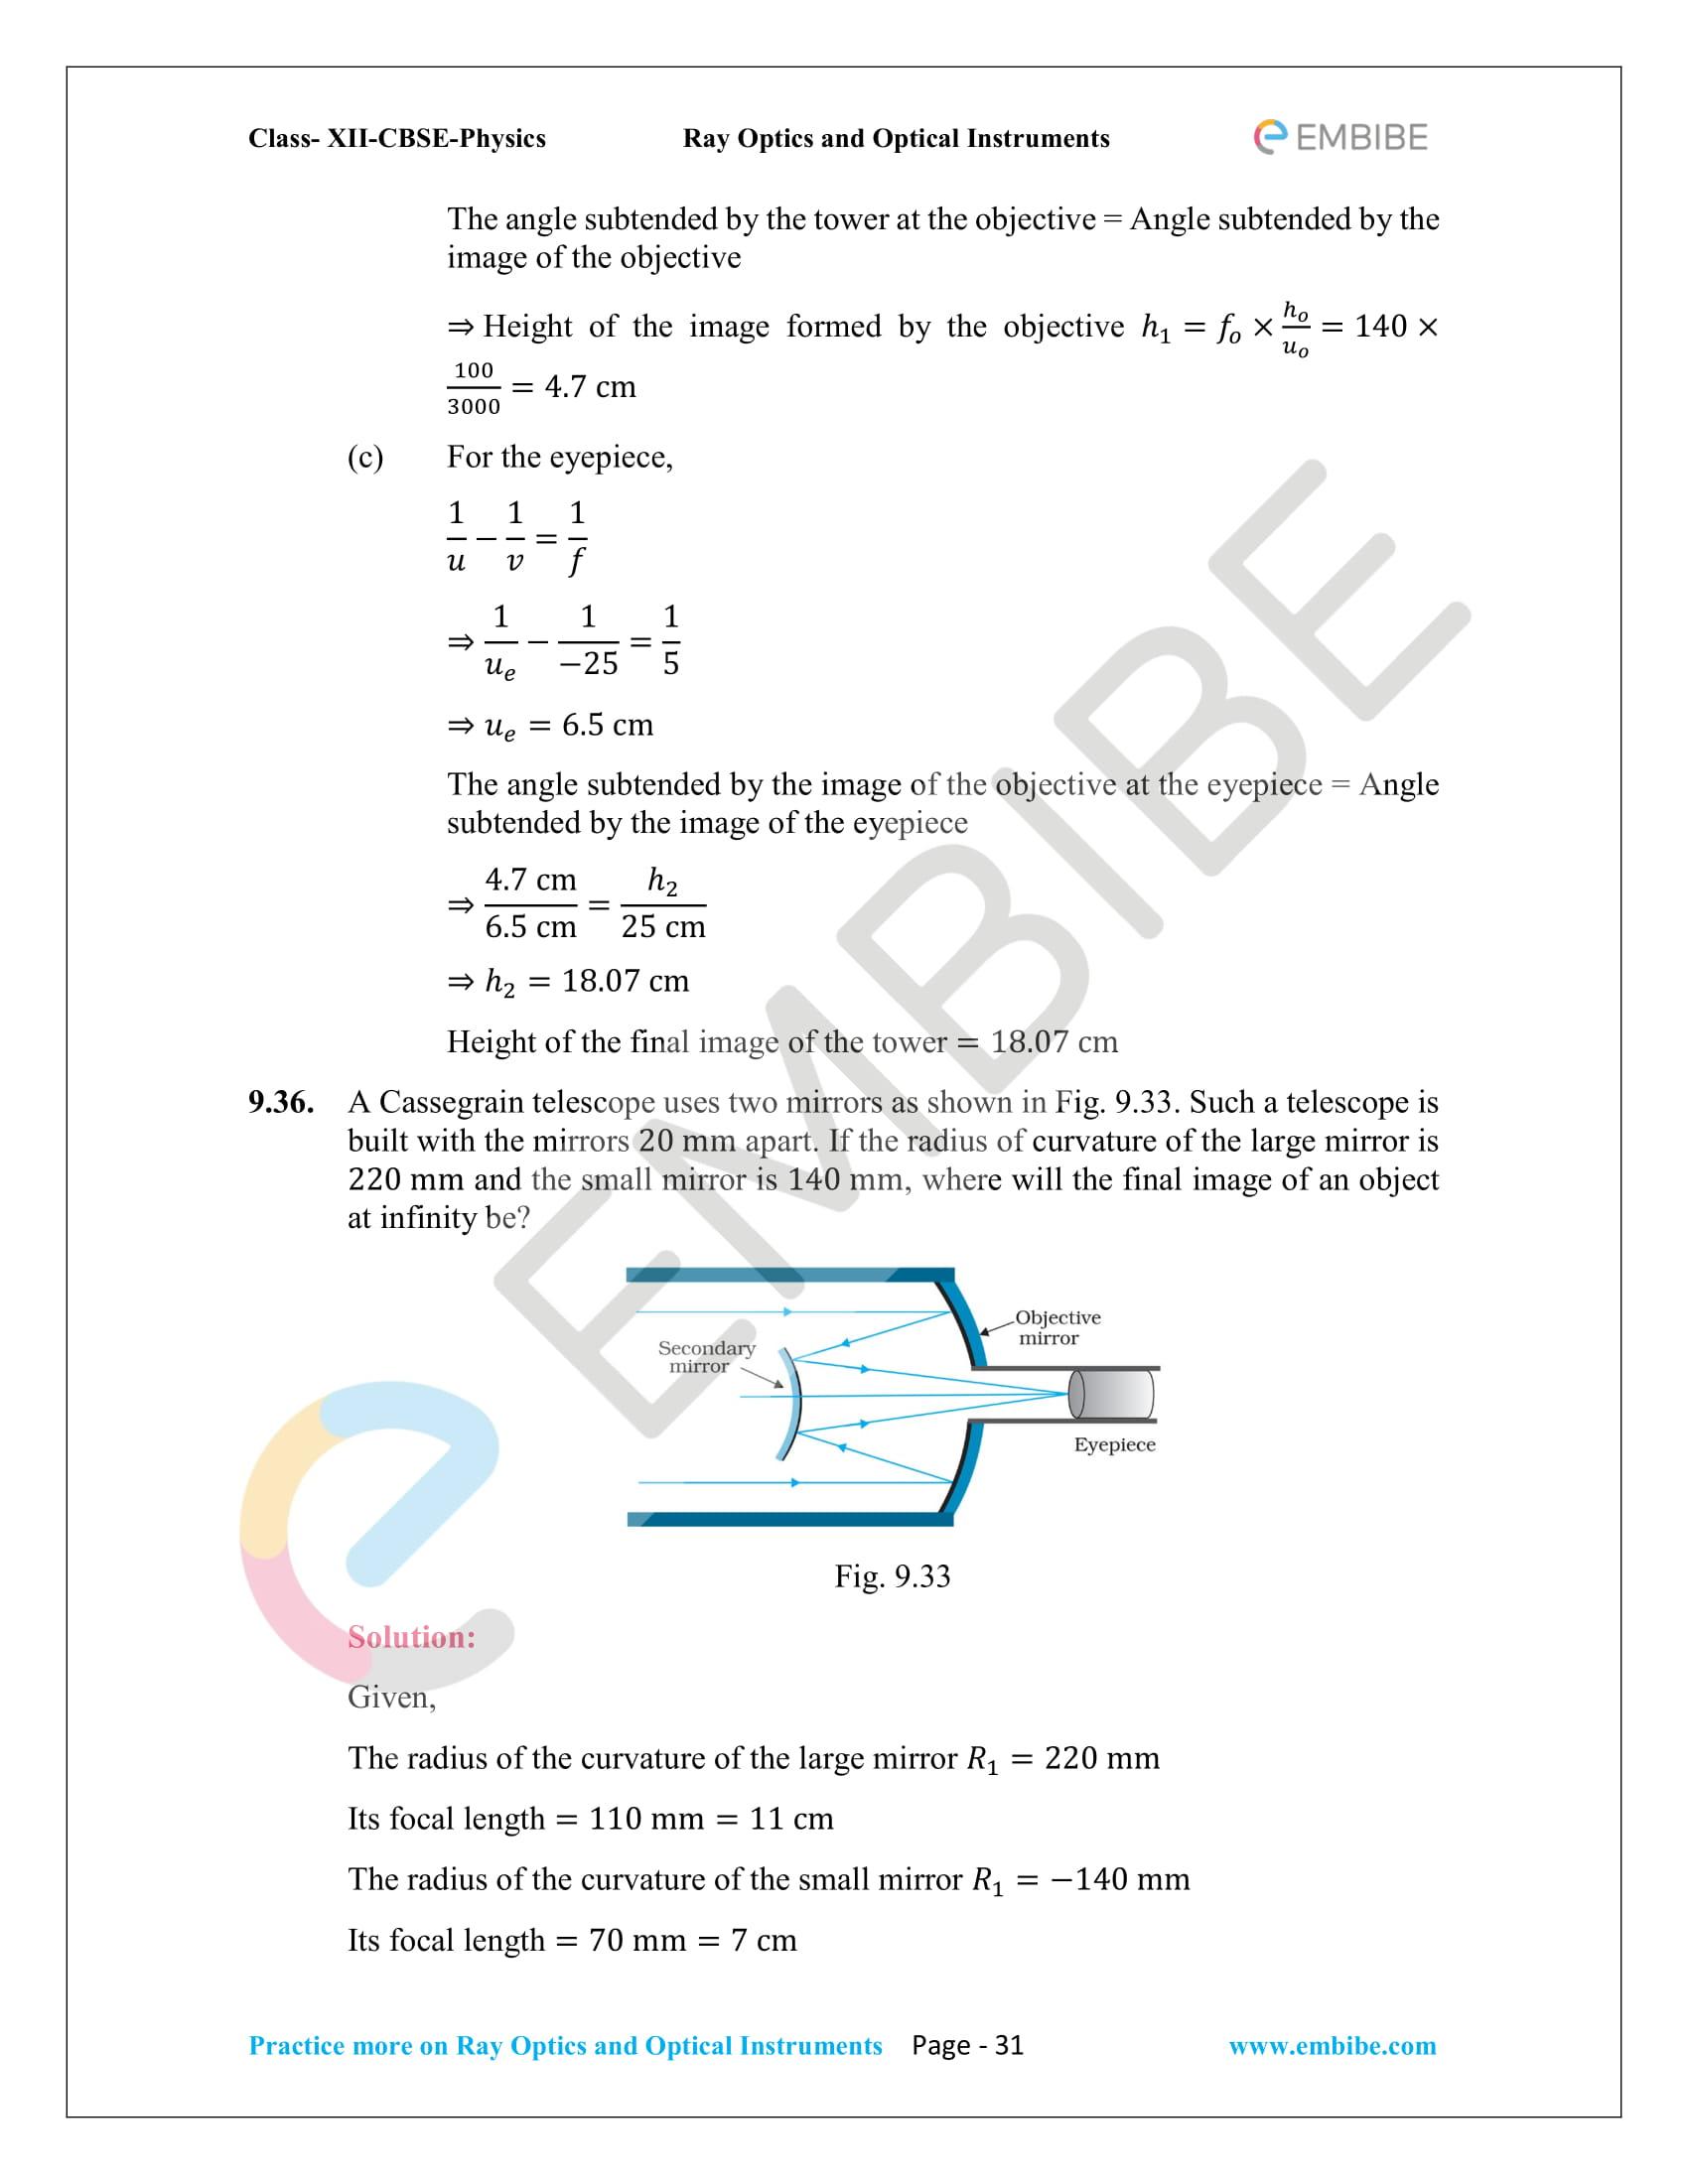 NCERT_Grade 12_Physics_Ch_09_Ray Optics-31